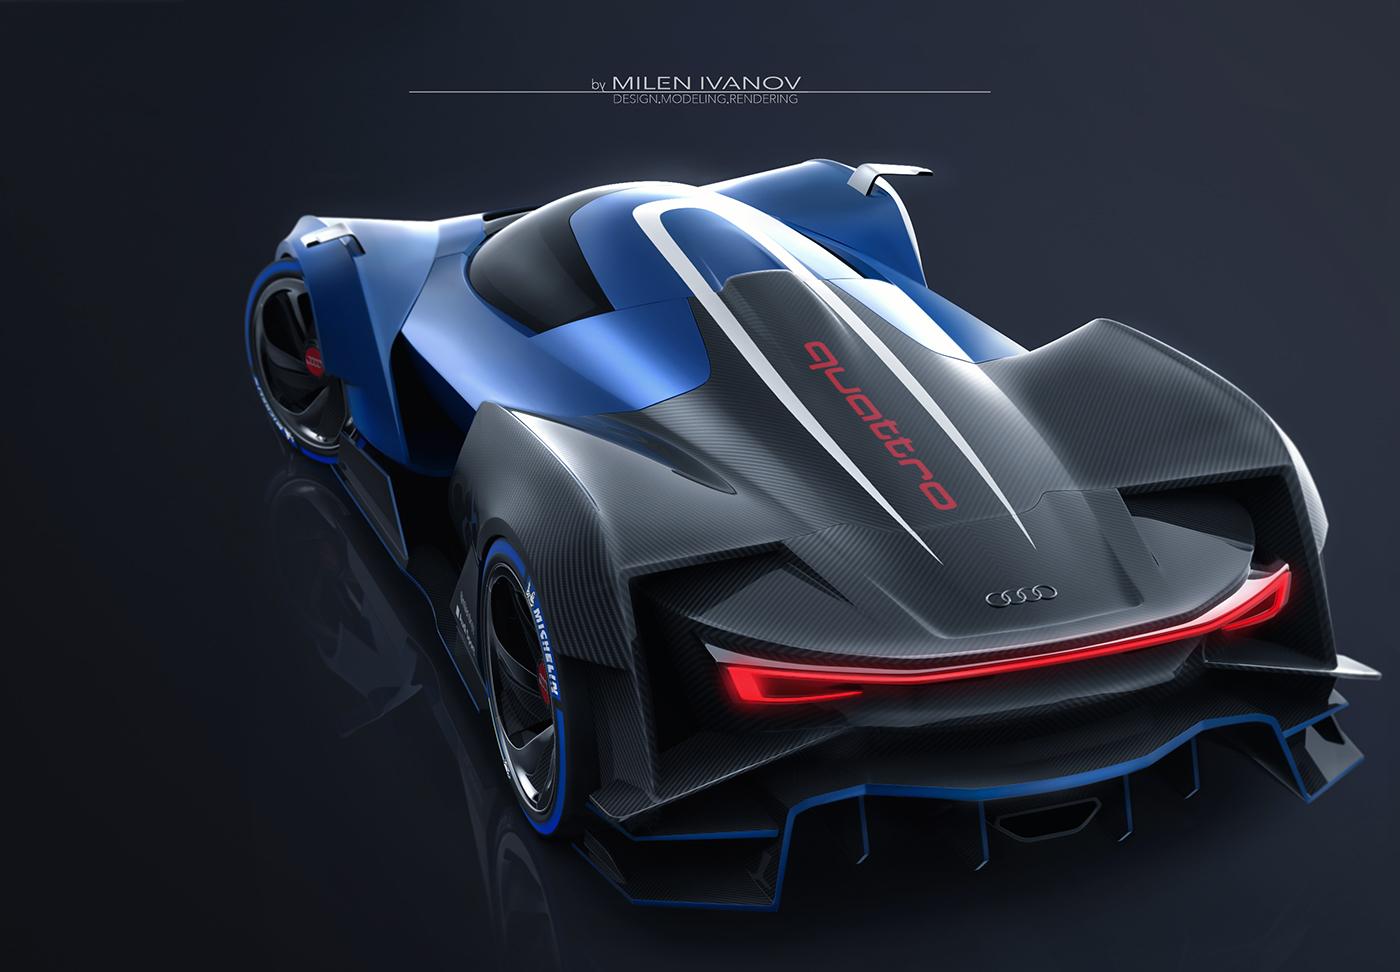 Audi concept 3D rendering car design 3dmodel